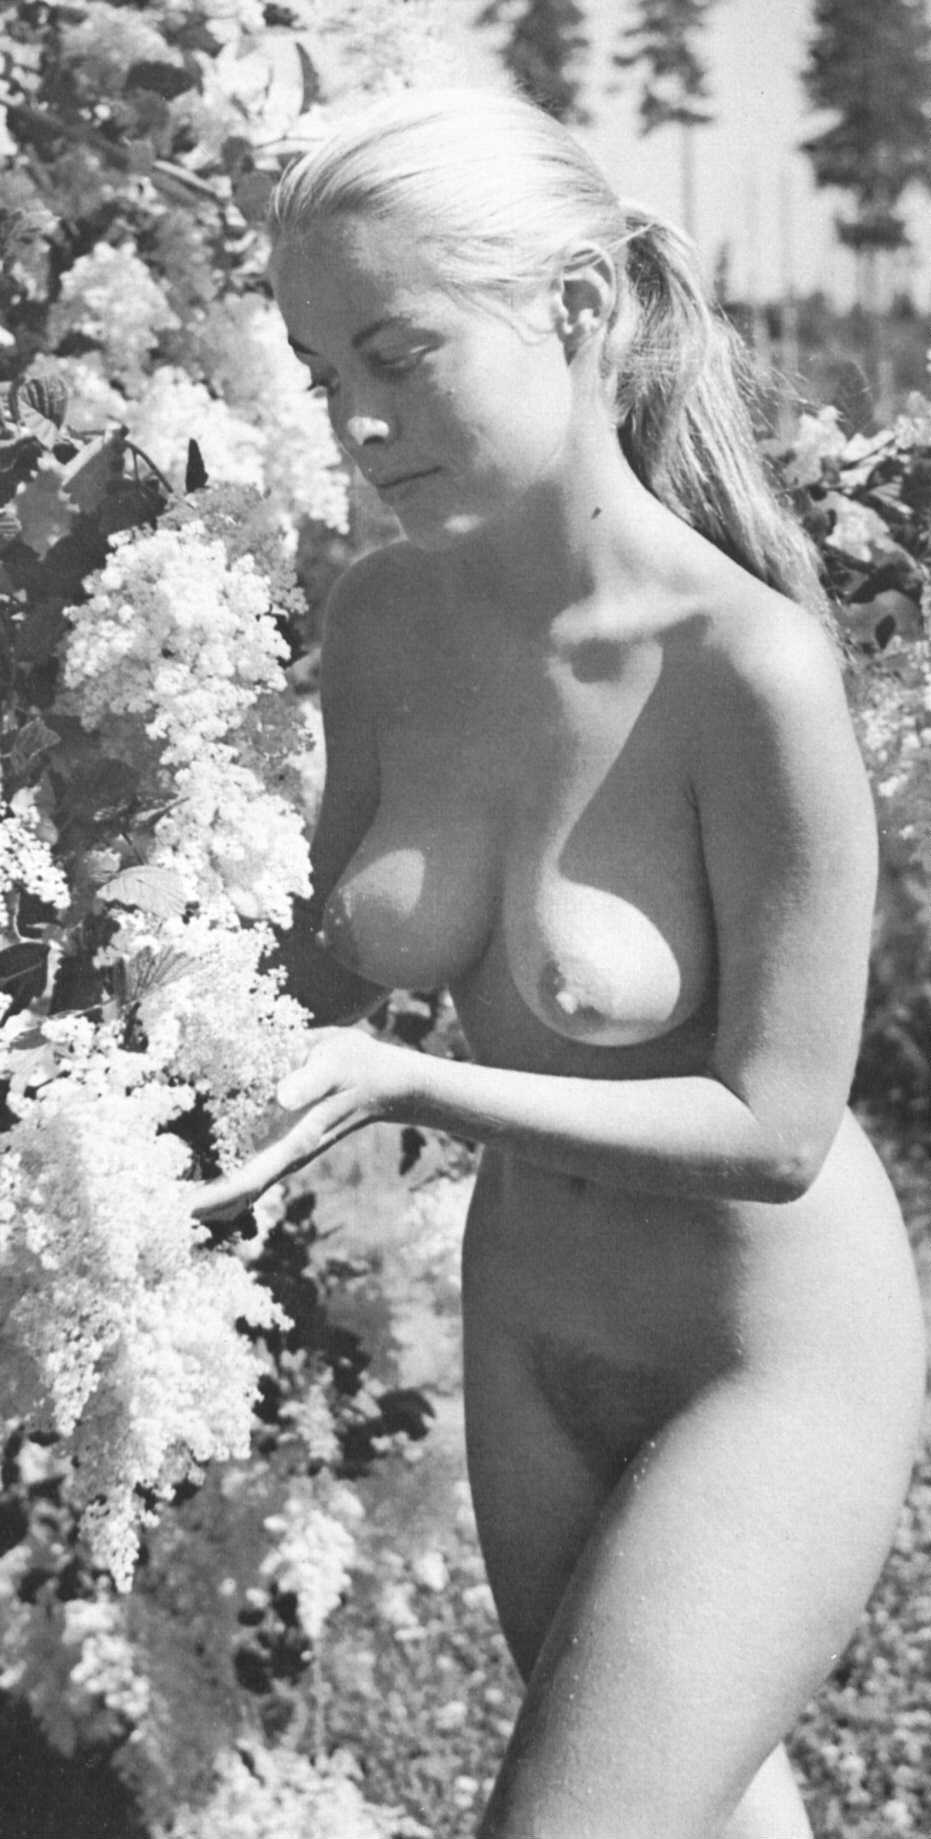 Nudist Fun Porn Videos Free Nudist Fun Tube Sex Movies Xxx Clips Page 1